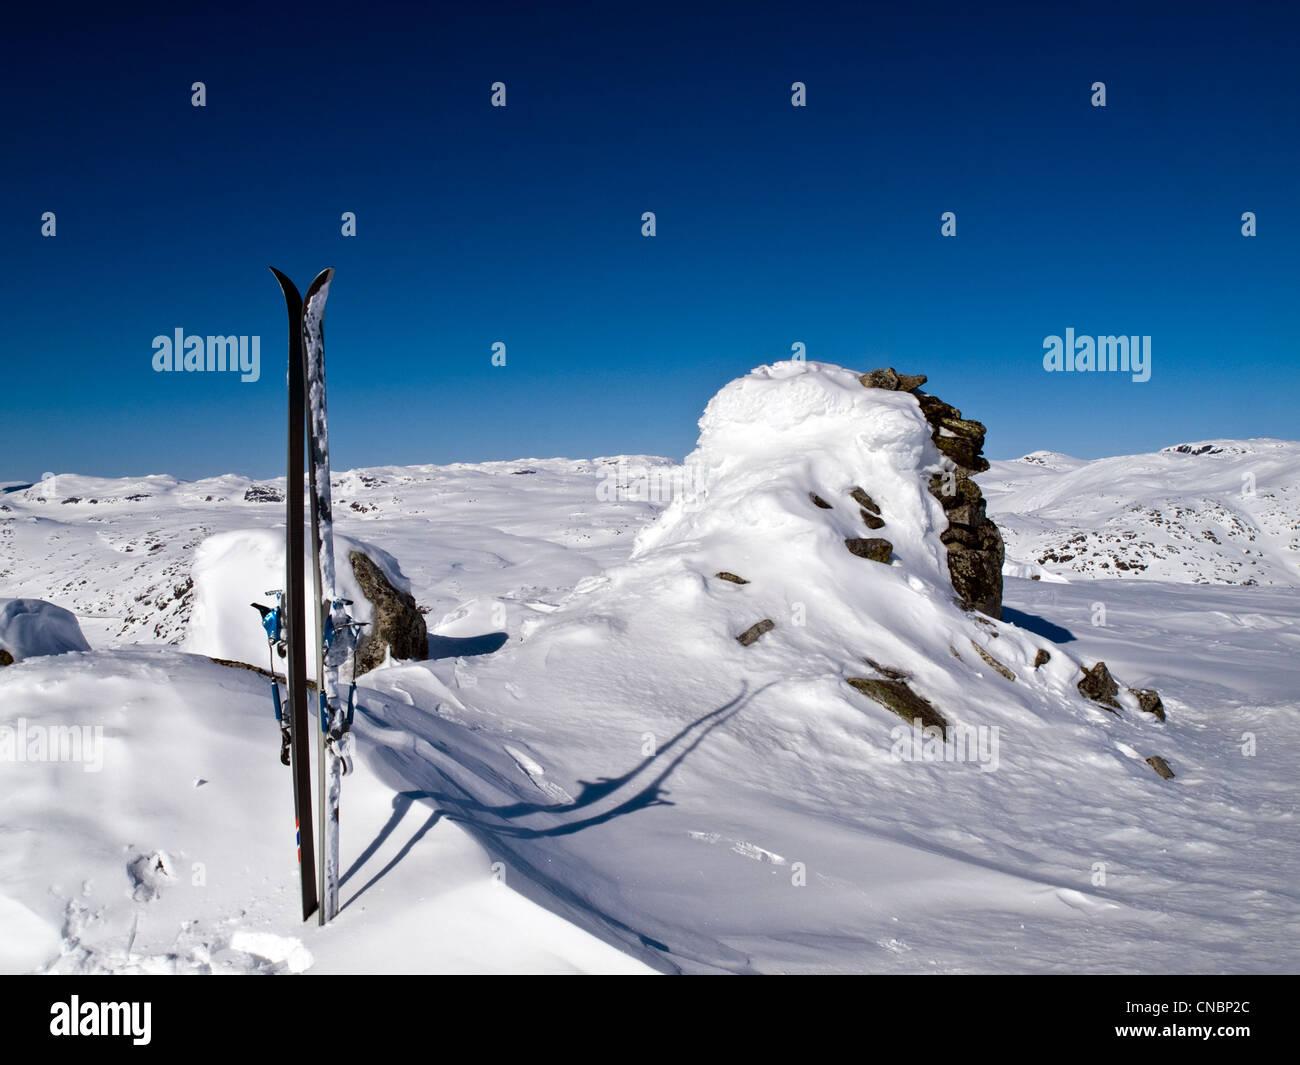 Pair of skis on summit. ski mountaineering in the Hardanger region of Norway - Stock Image